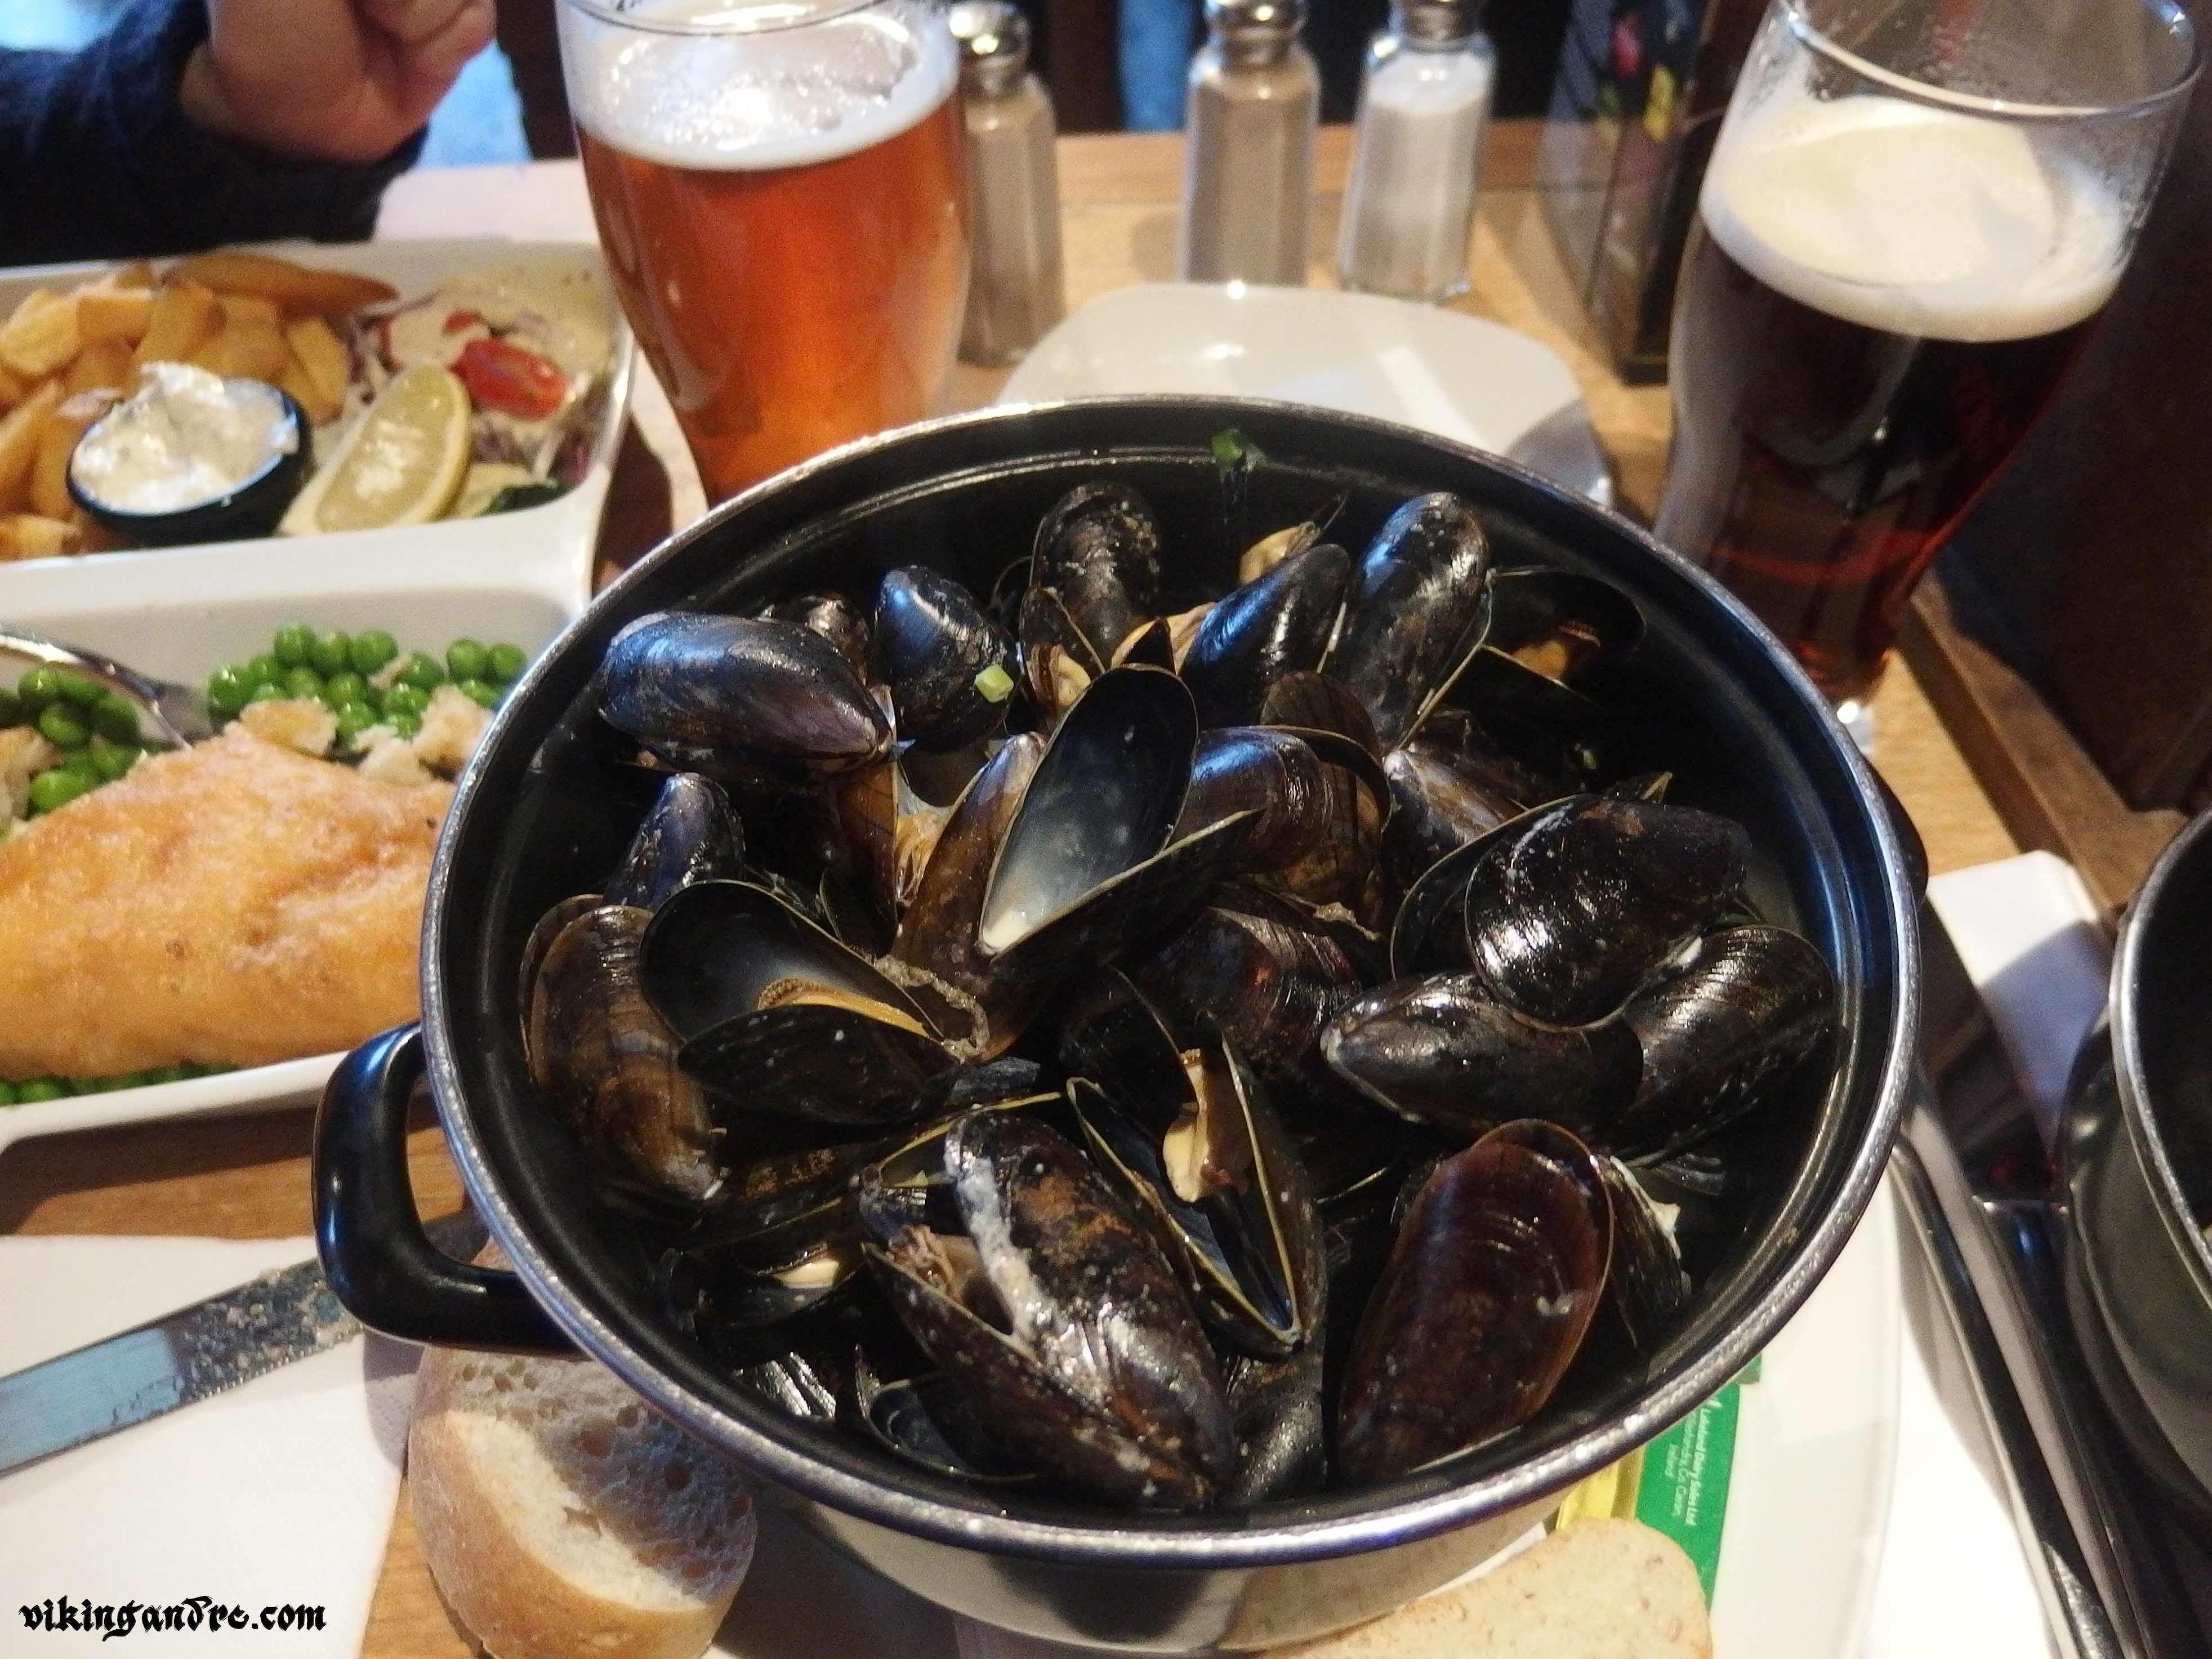 Fish&chips, mussels, craft beer @ The Porterhouse, Temple Bar, Dublin, Ireland (vikingandre.com)